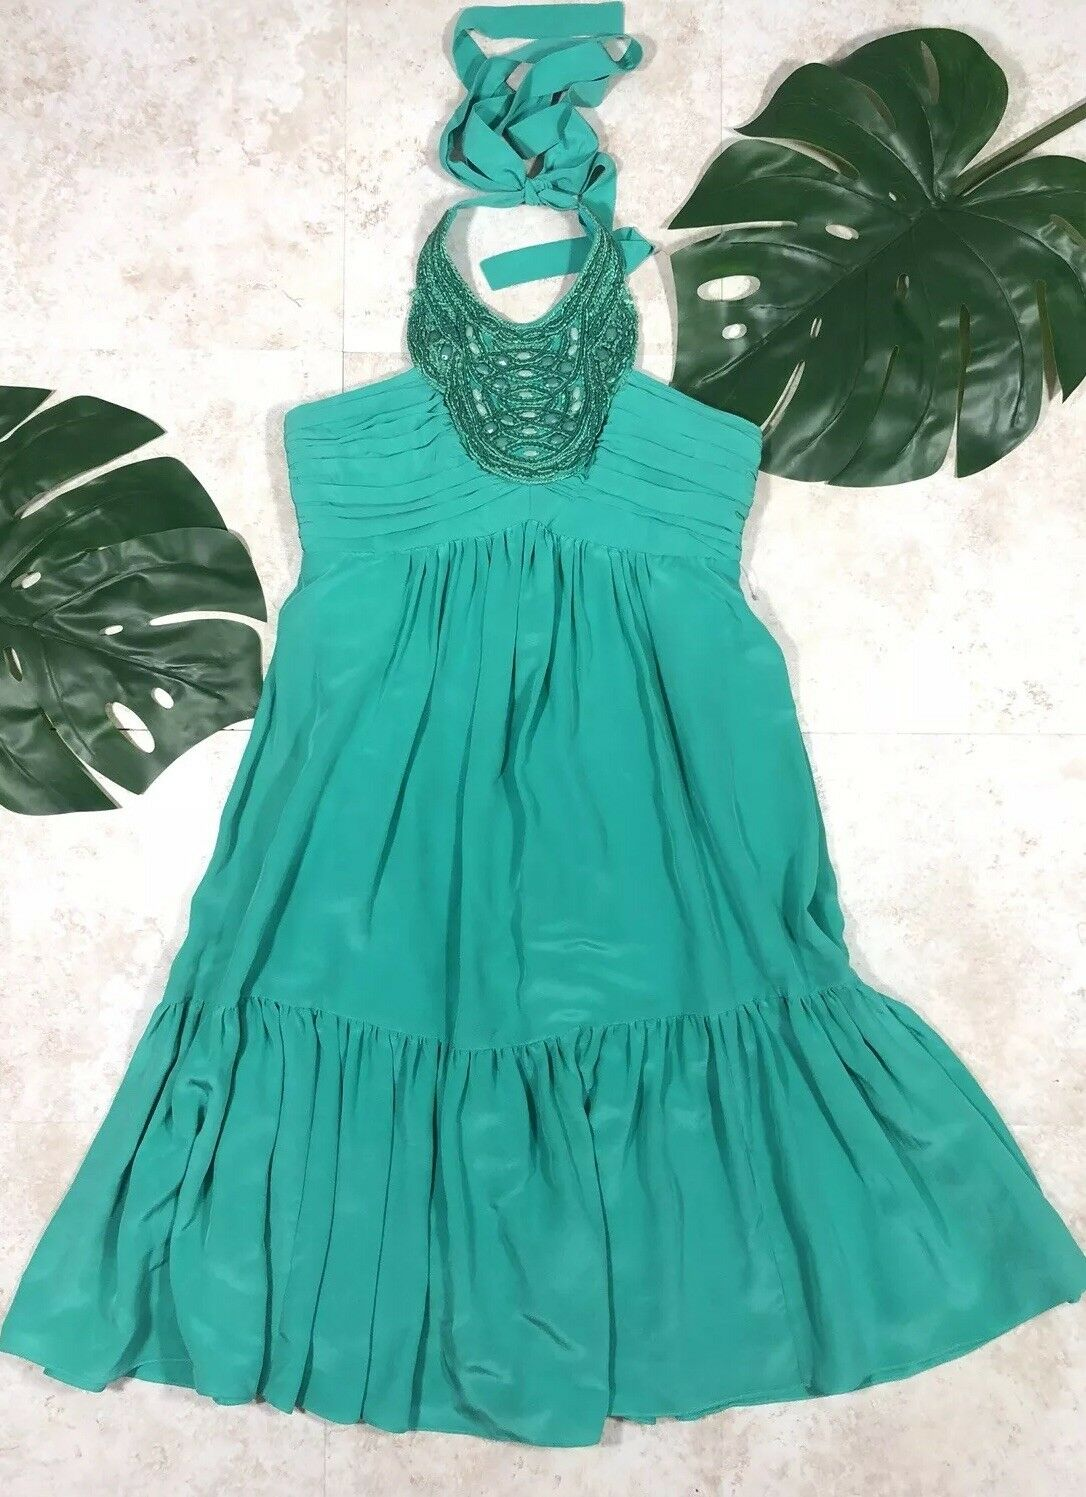 Shoshanna damen 100% silk beaded embellished corset halter dress Sz 4